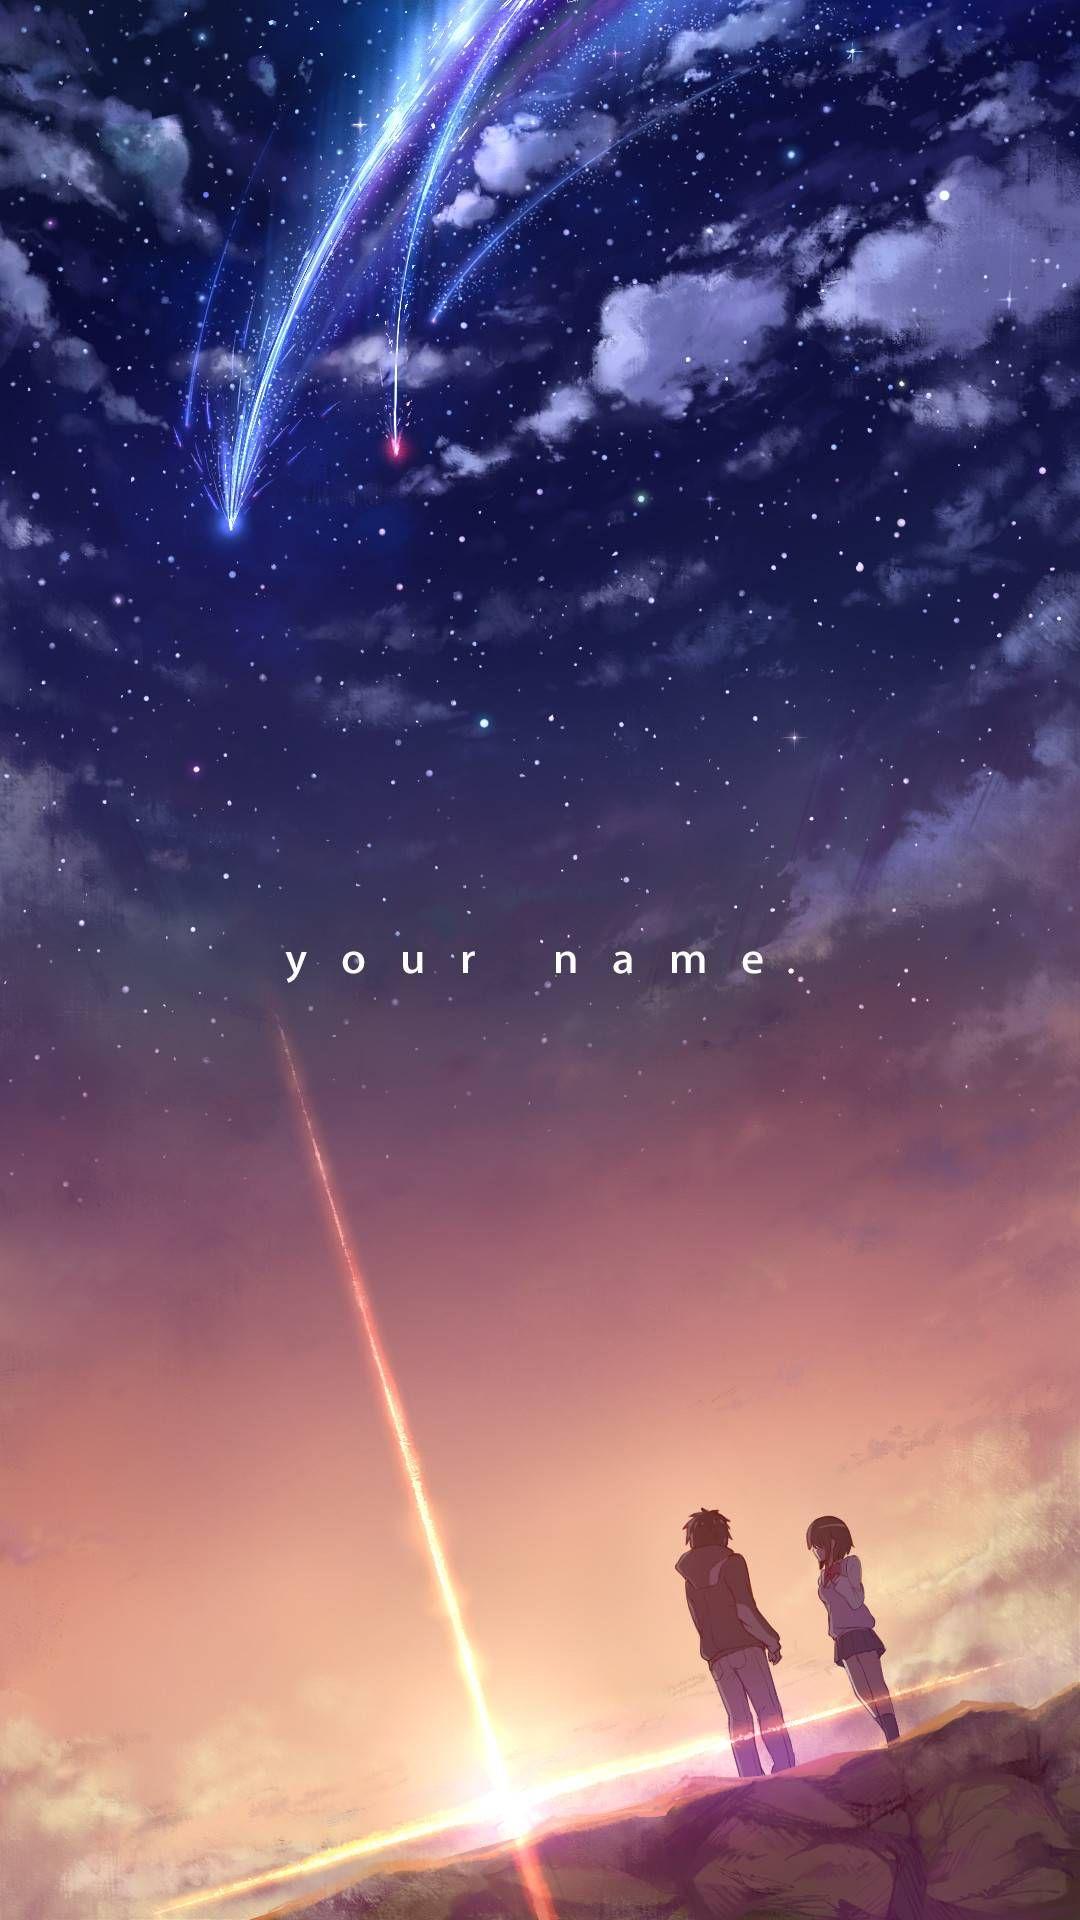 Your Name/Kimi no na wa   Anime   Kimi no na wa wallpaper, Kimi no na e Your name anime